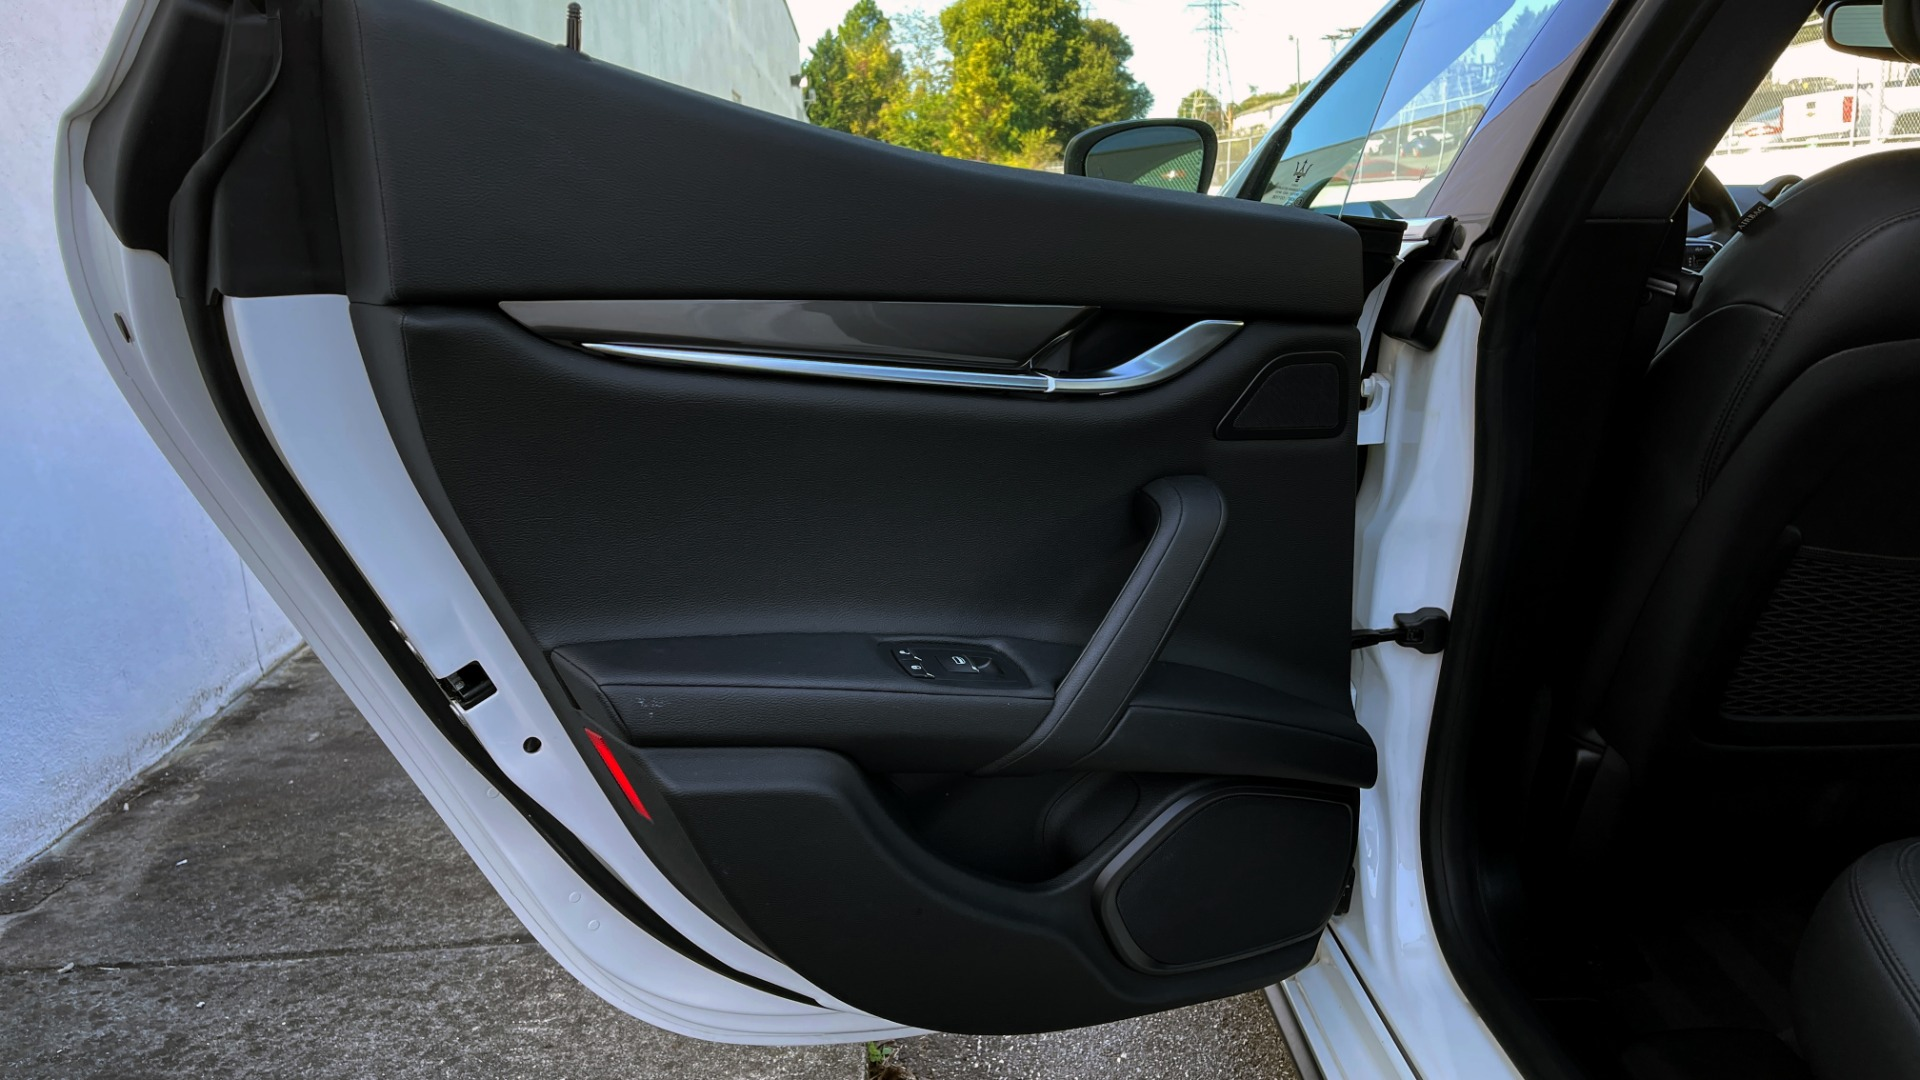 Used 2018 Maserati GHIBLI SEDAN / RWD / 3.0L V6 / SUNROOF / NAV / REARVIEW for sale $42,995 at Formula Imports in Charlotte NC 28227 50